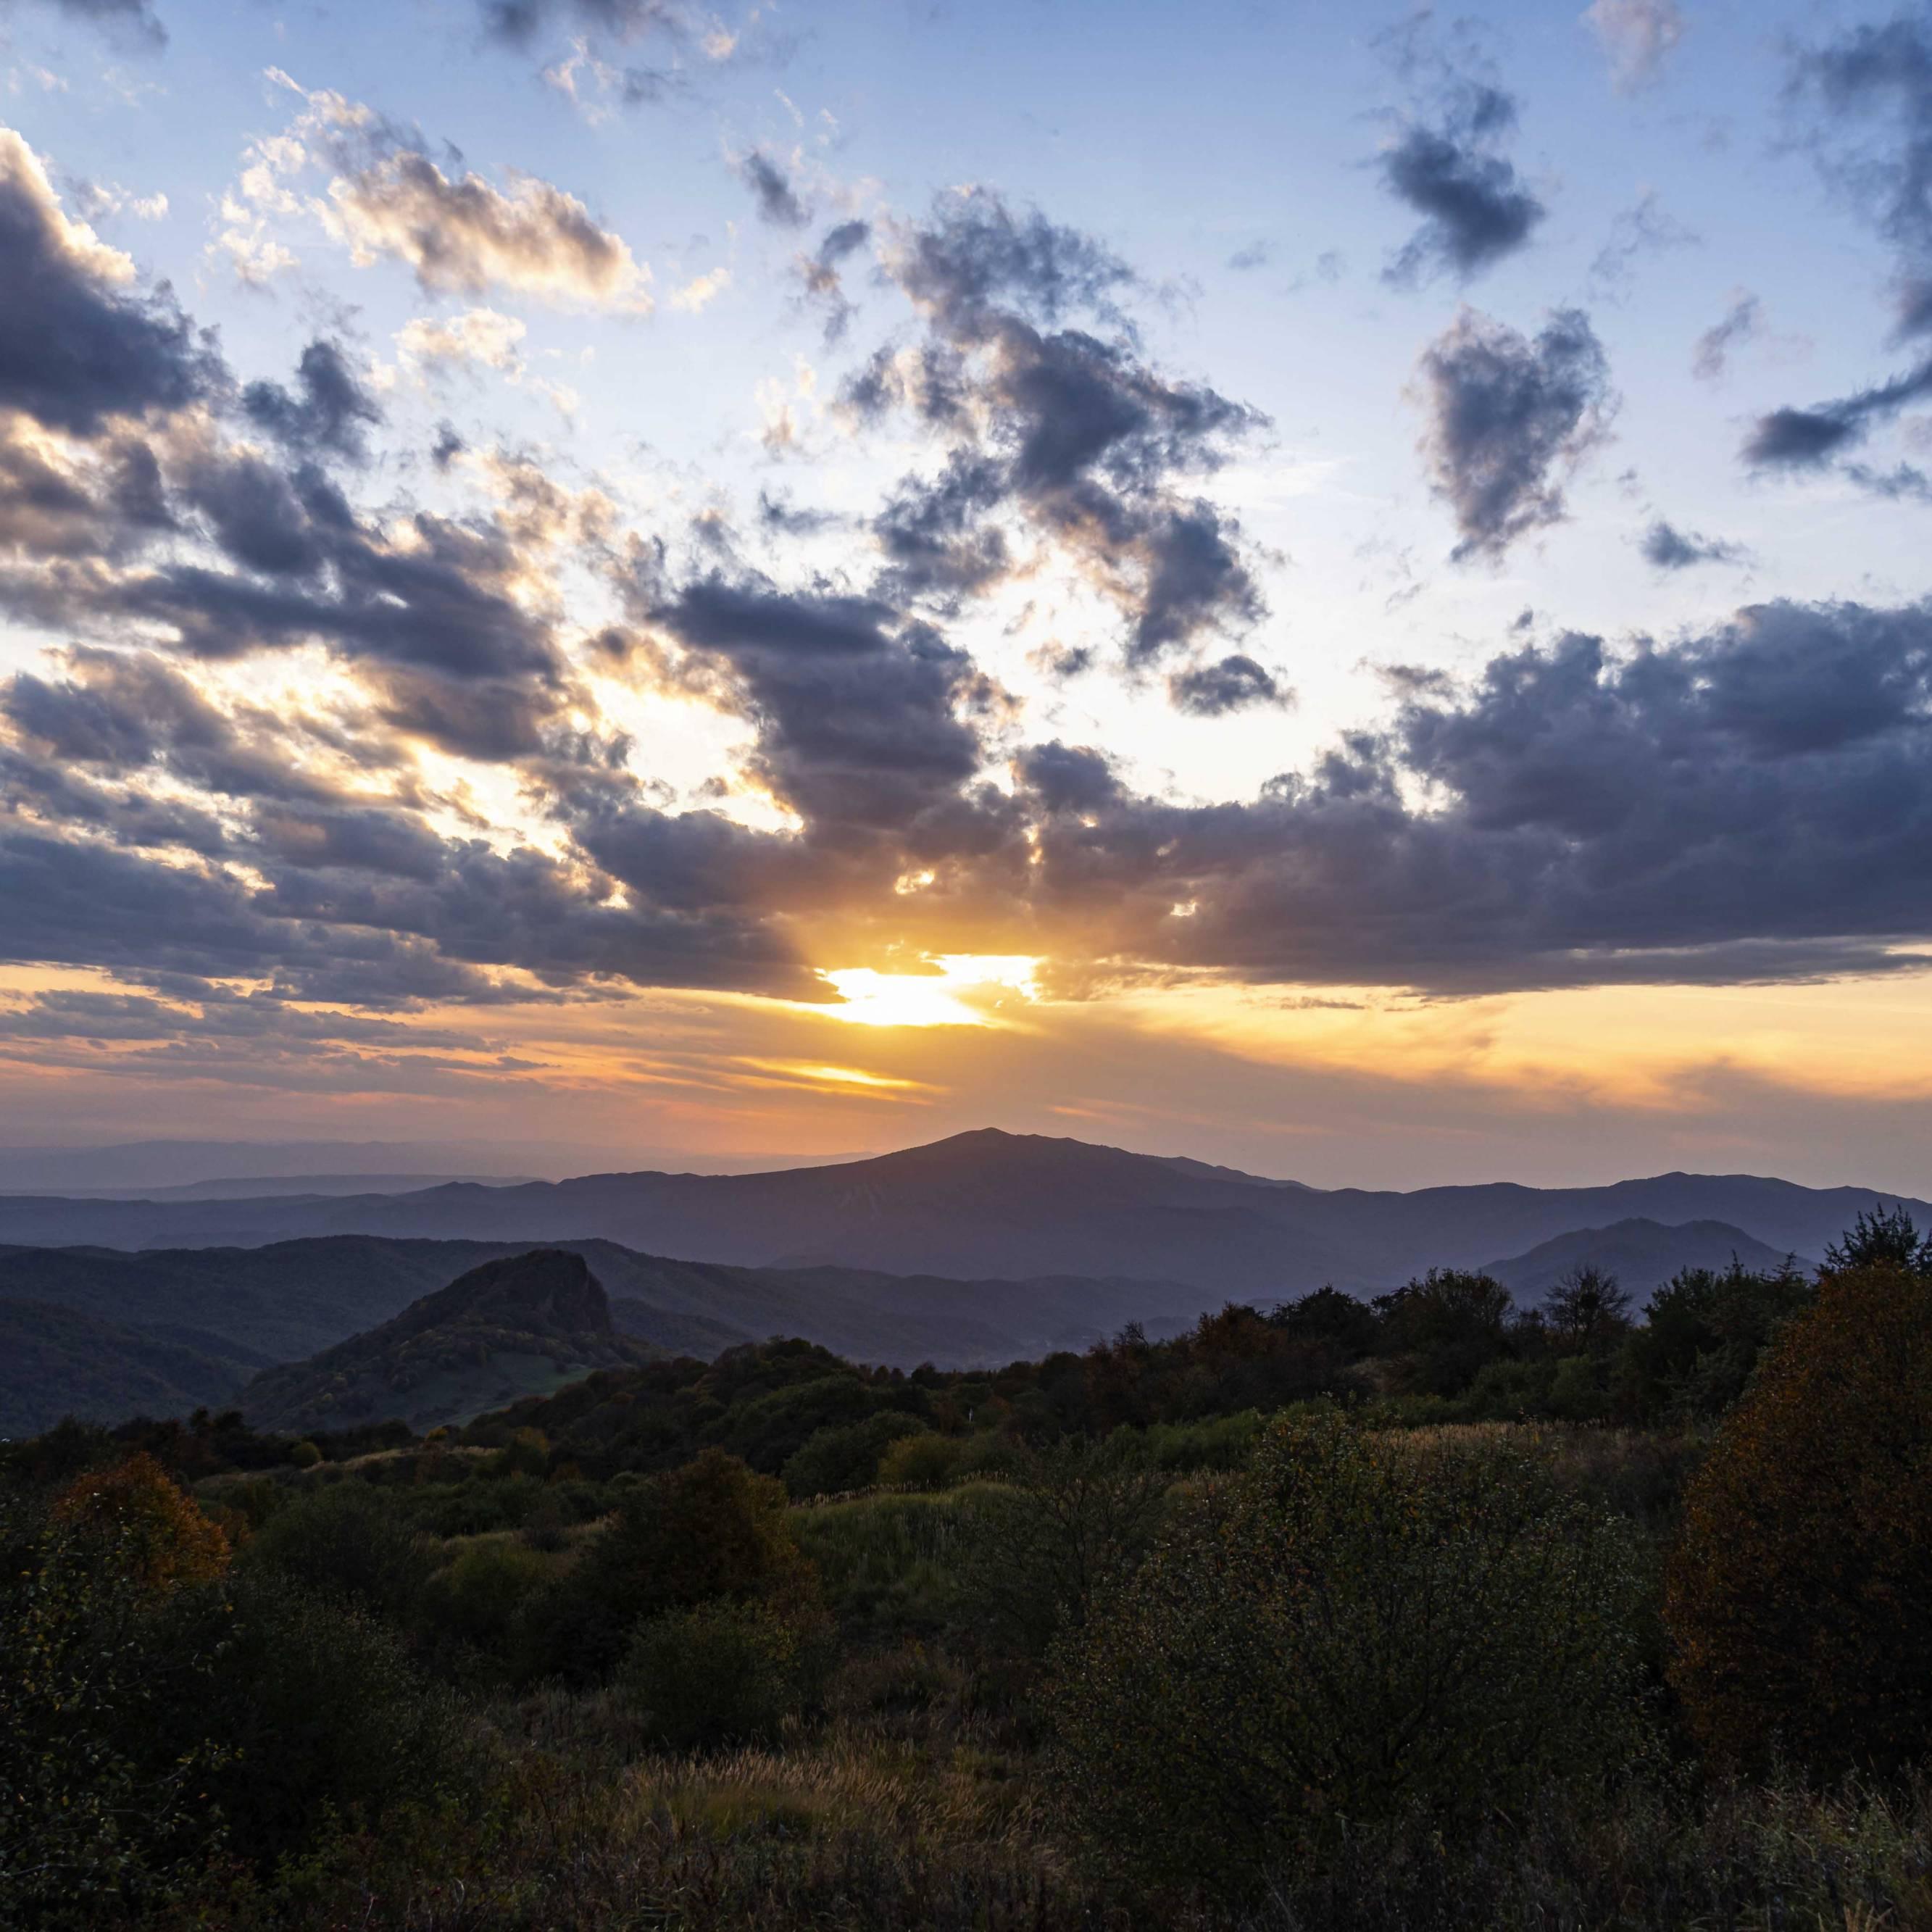 Kakheti landscapes